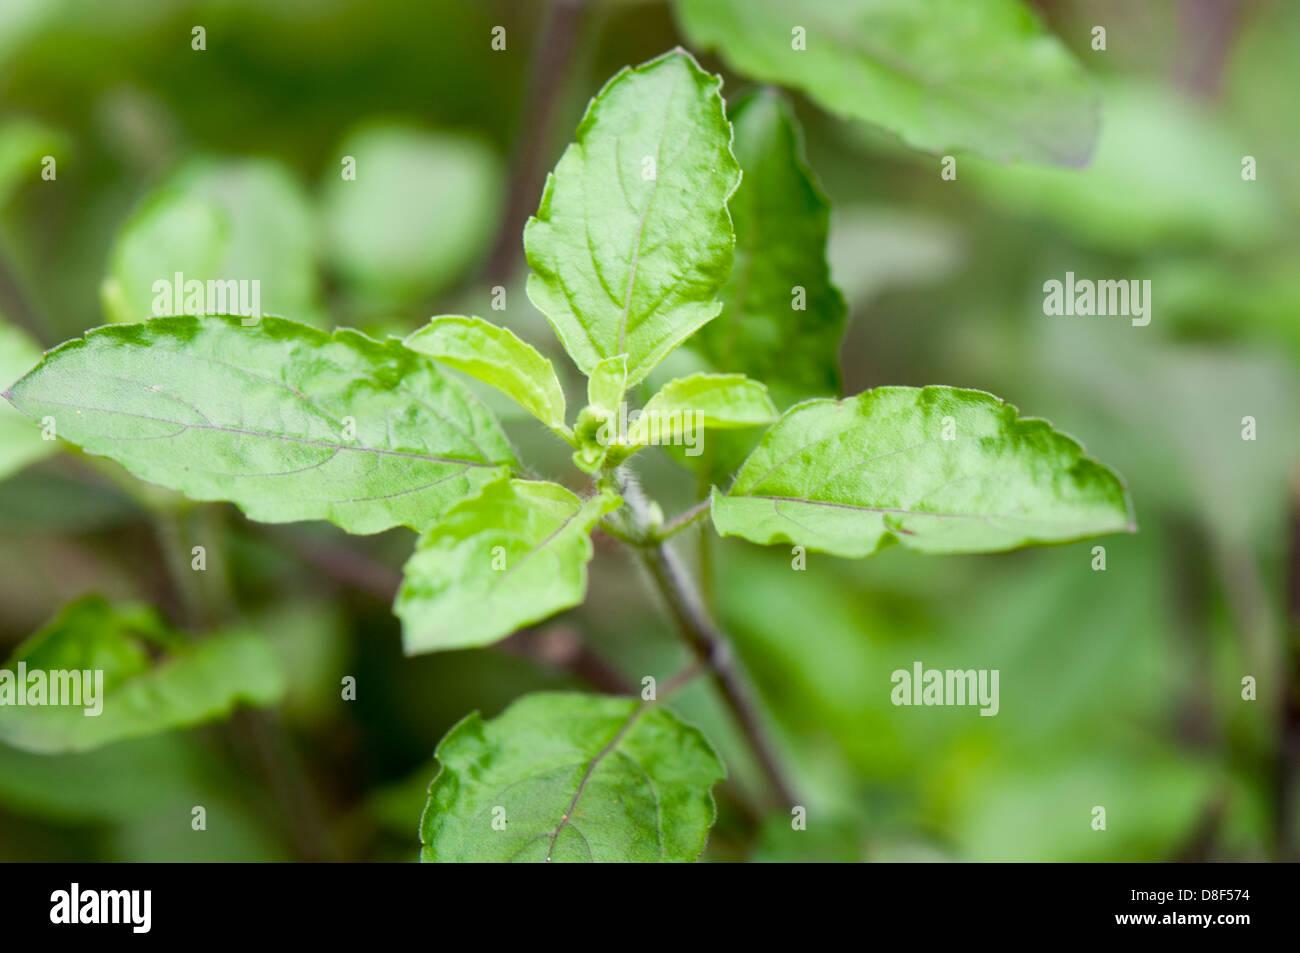 Tulsi Plant Stock Photos & Tulsi Plant Stock Images - Alamy